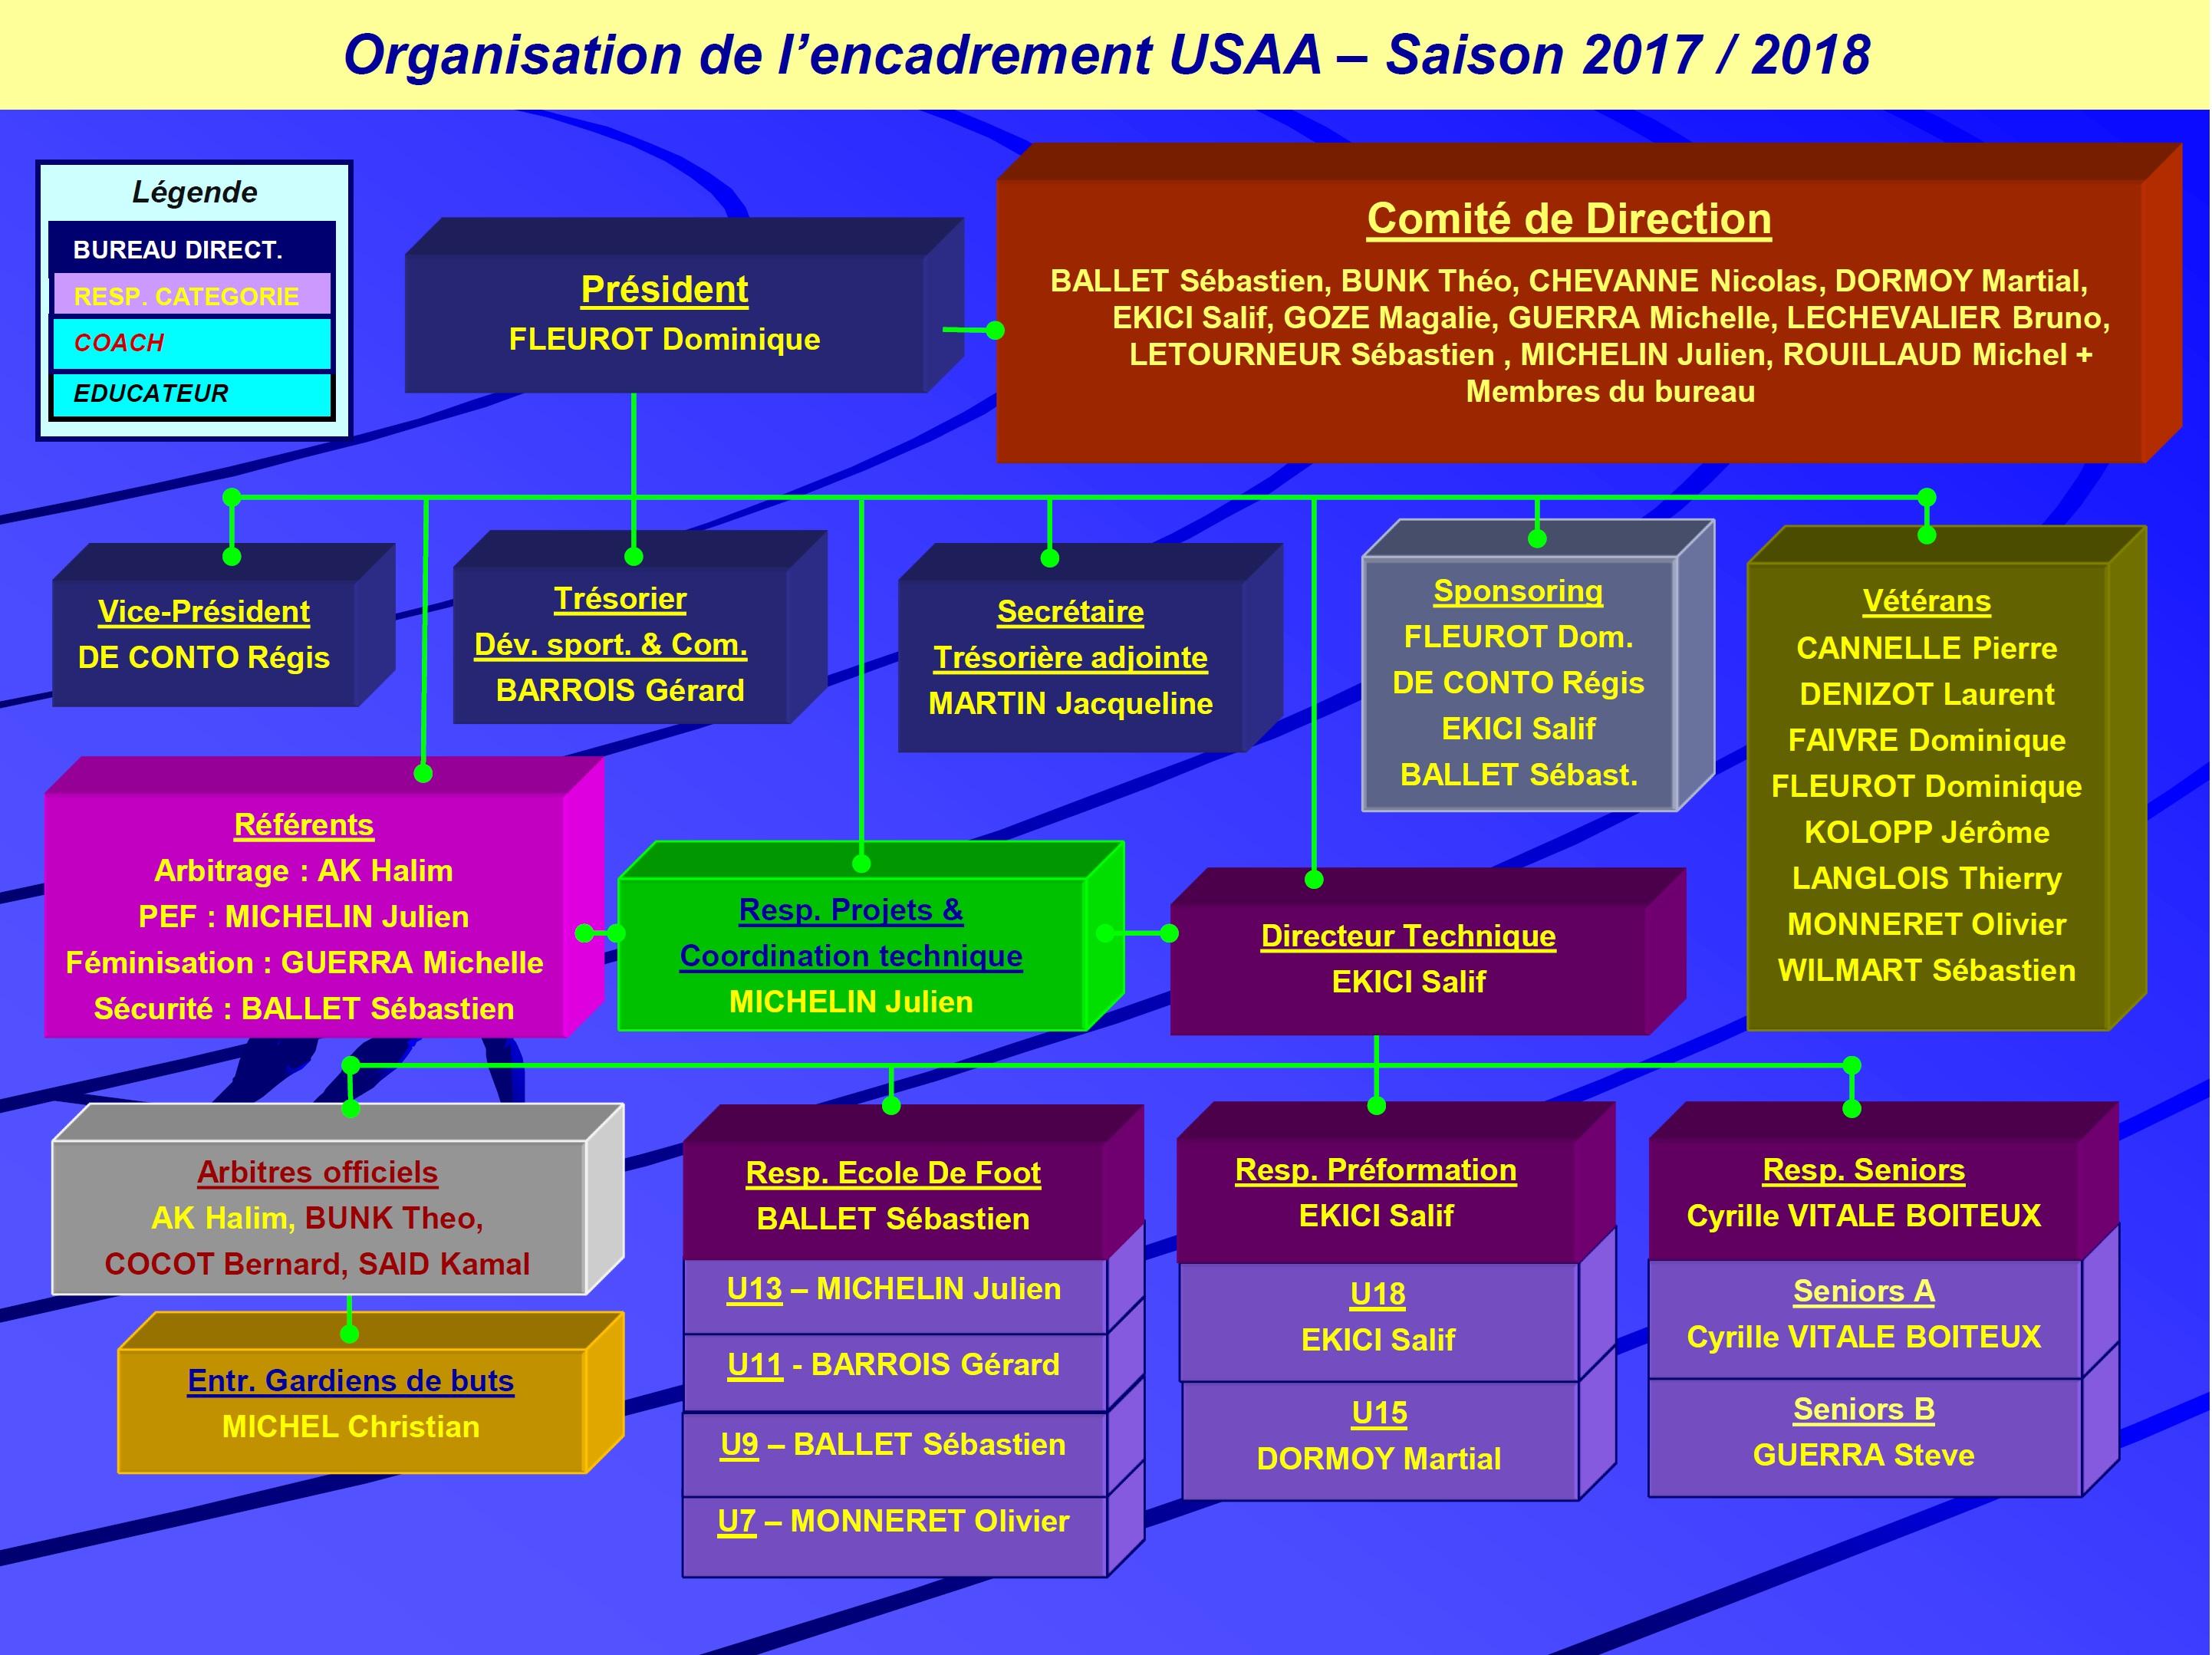 Organigramme USAA - 2017 2018